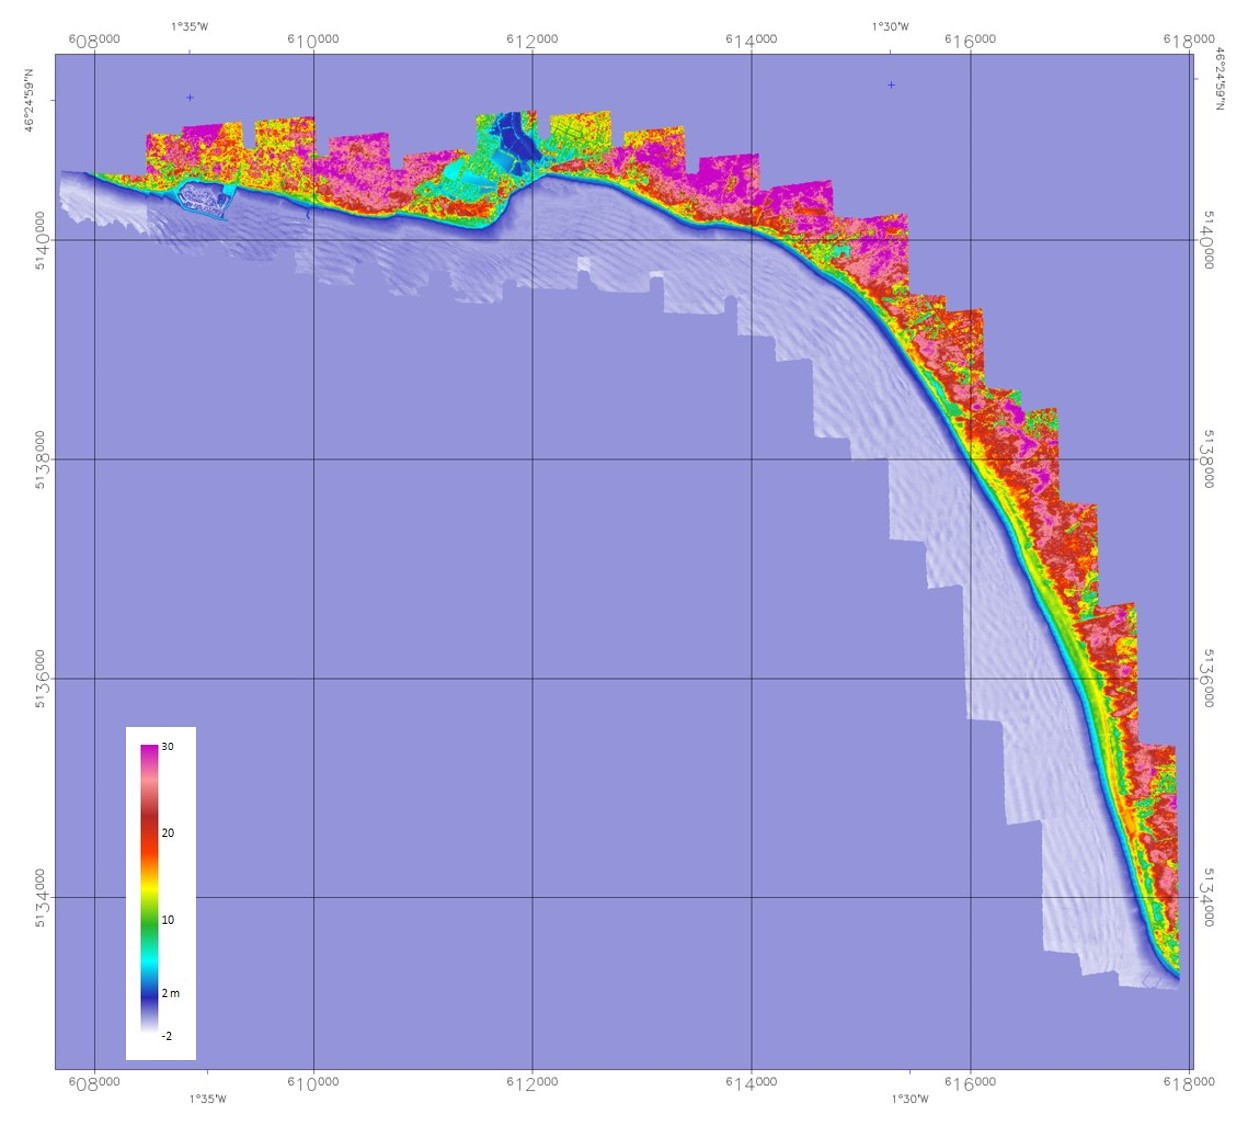 MNS LIDAR Jard sur Mer 2013